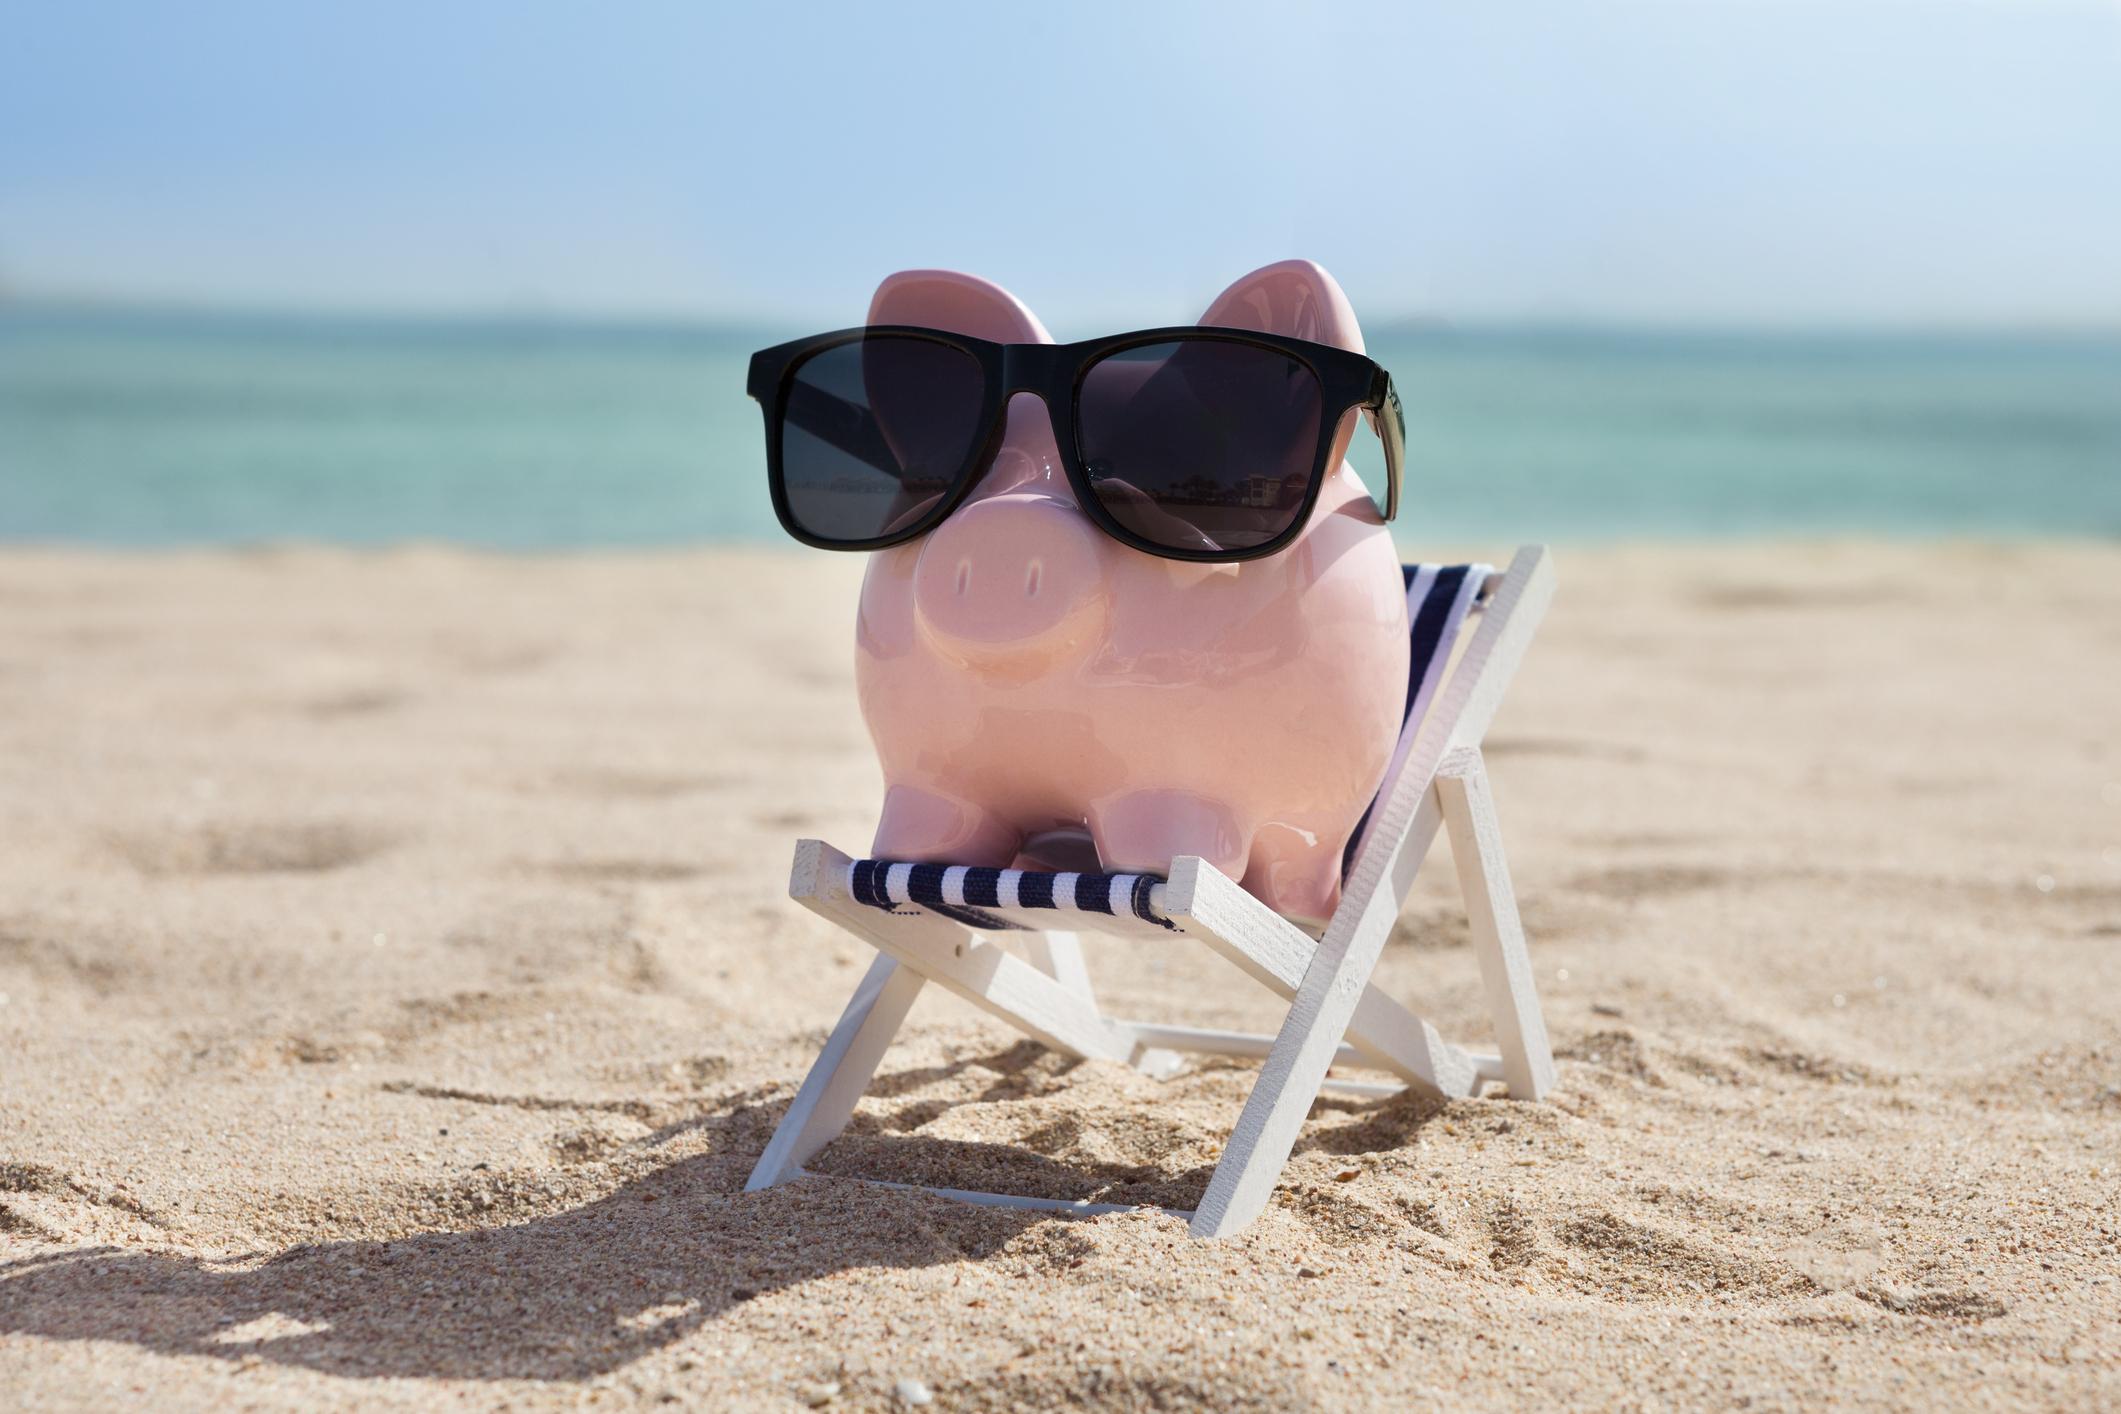 Piggybank wearing sunglasses on the beach.